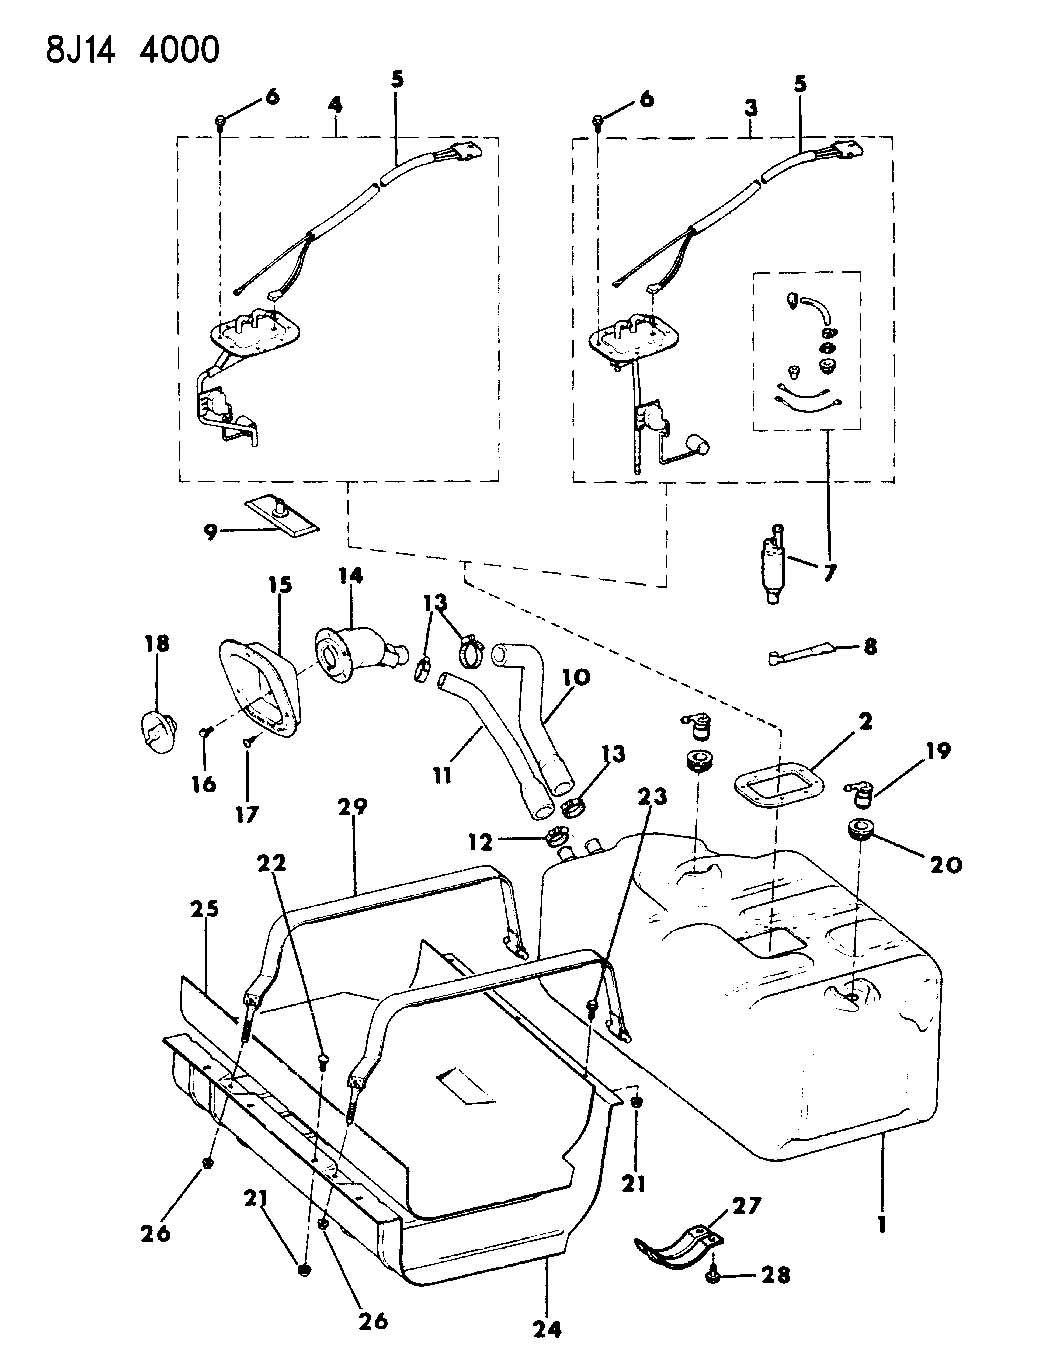 1989 jeep wrangler fuel tank 20 0 gallon wrangler yj. Black Bedroom Furniture Sets. Home Design Ideas